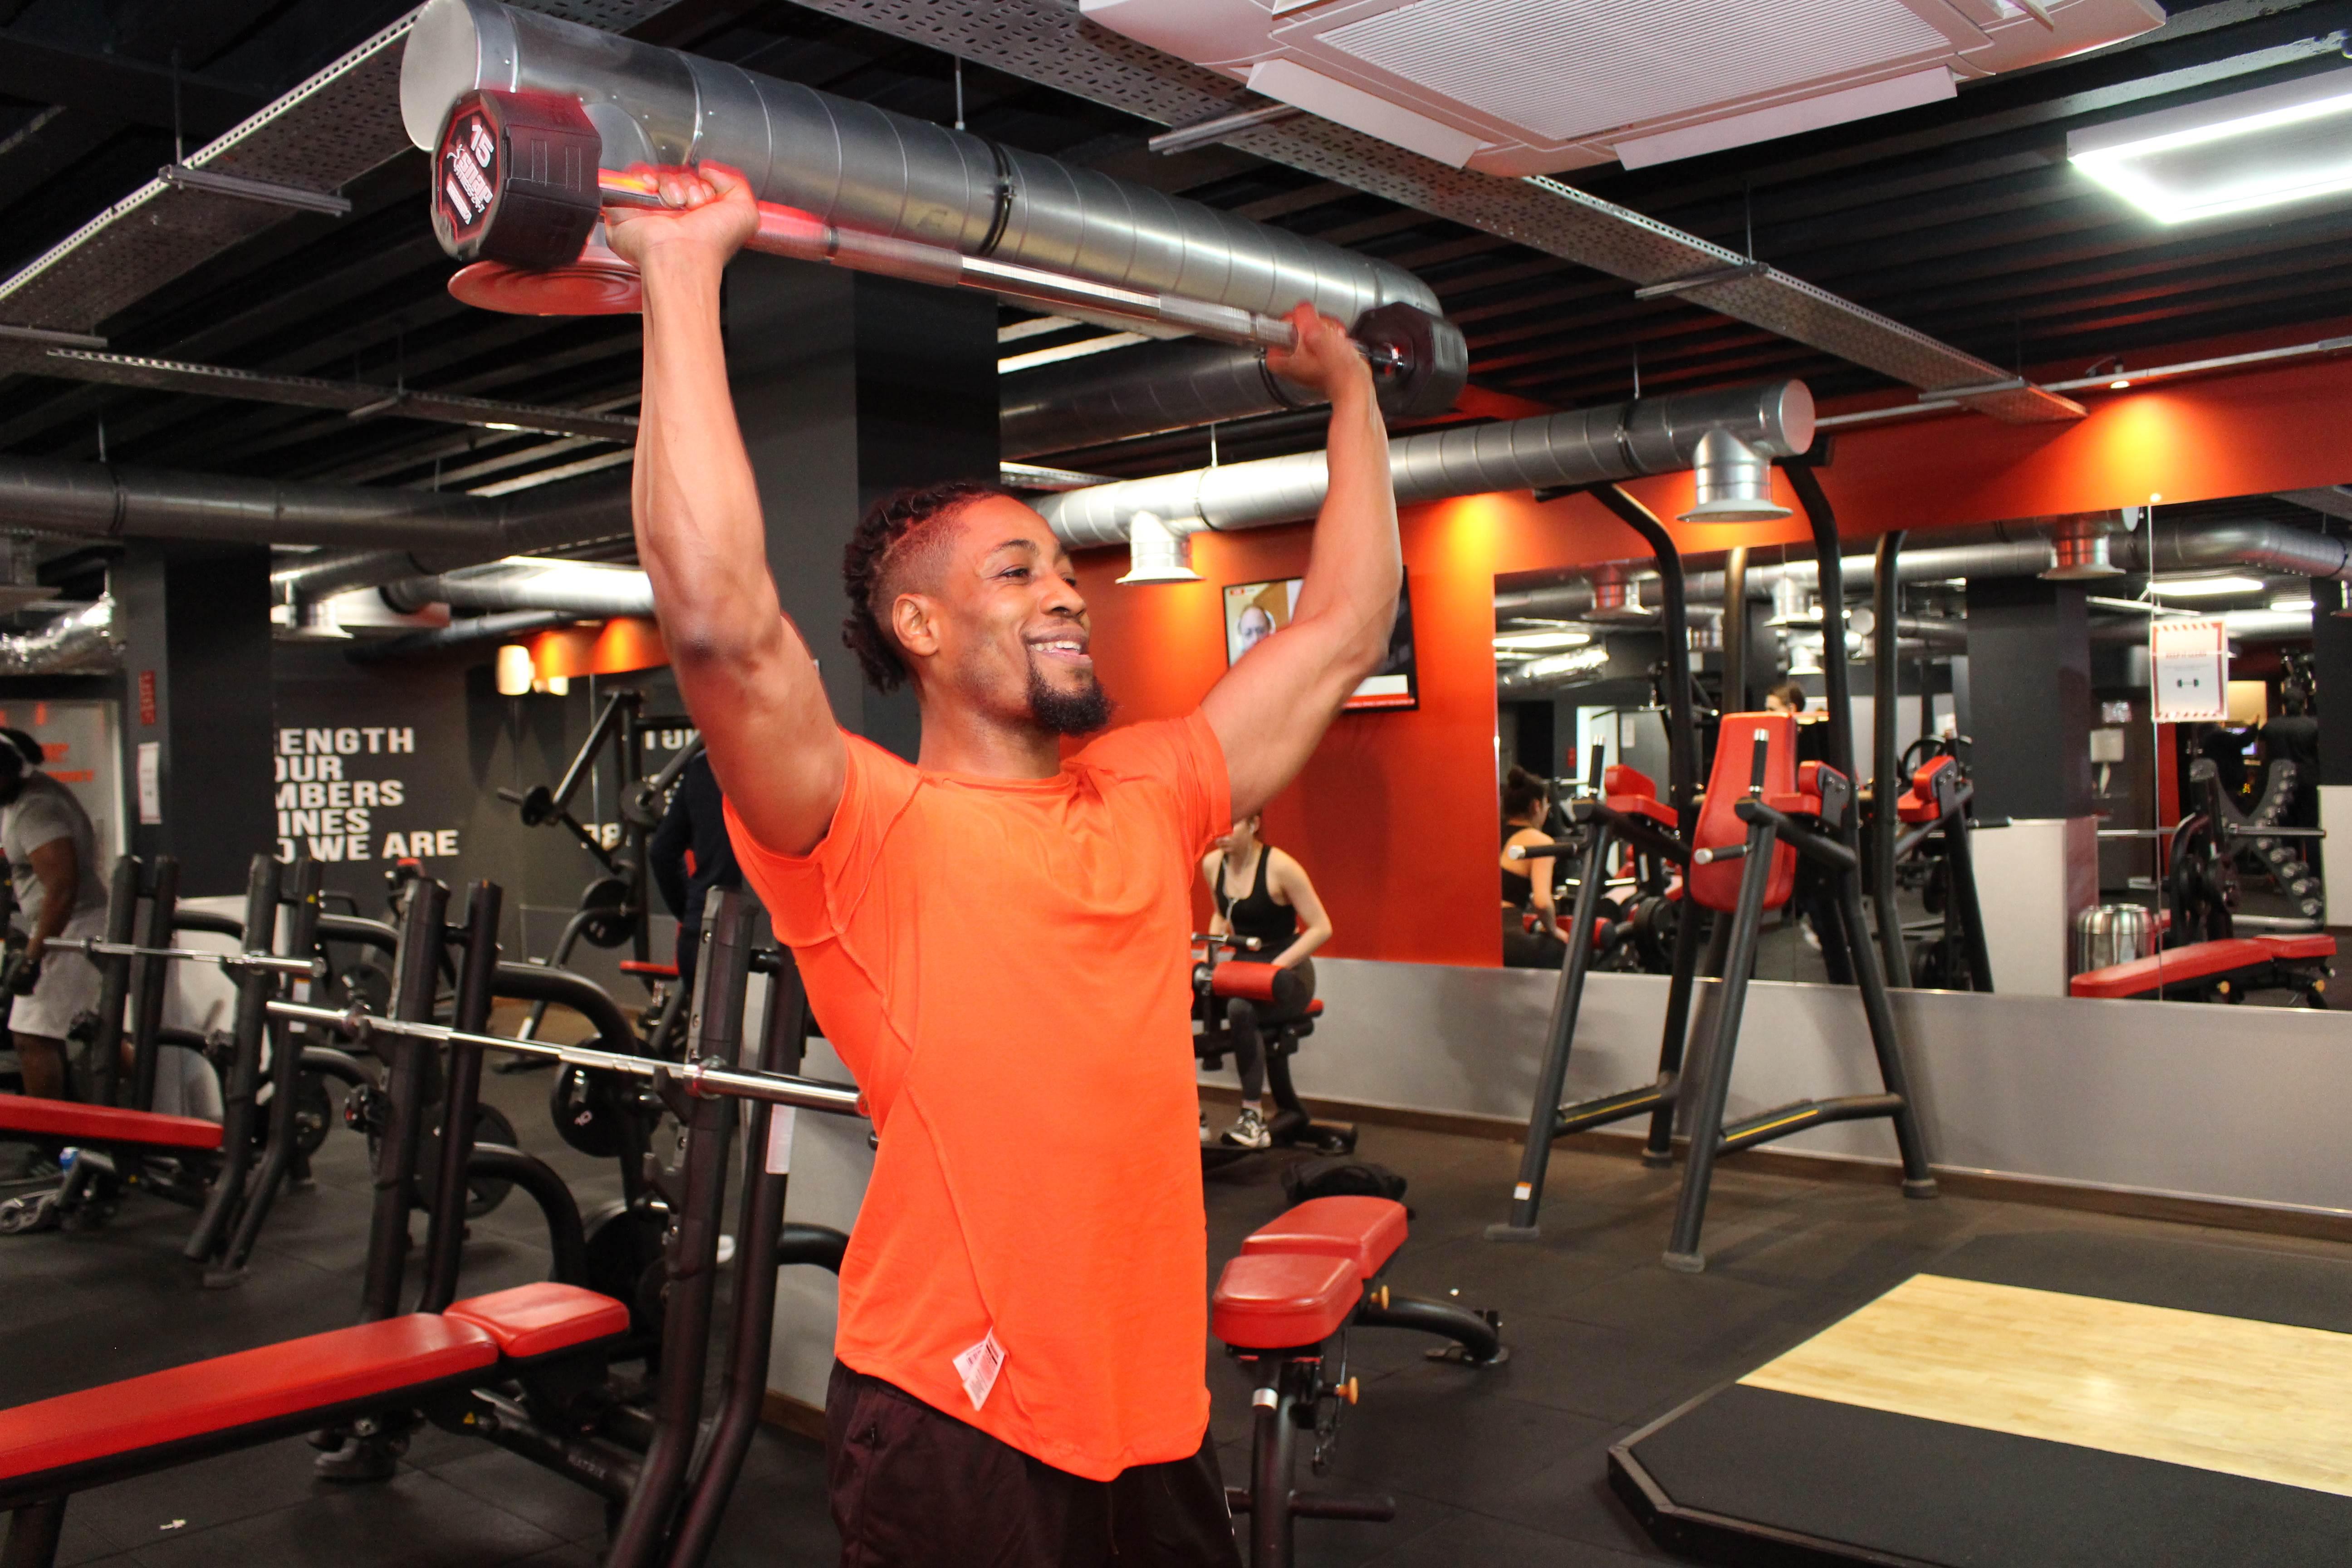 snap fitness orange man